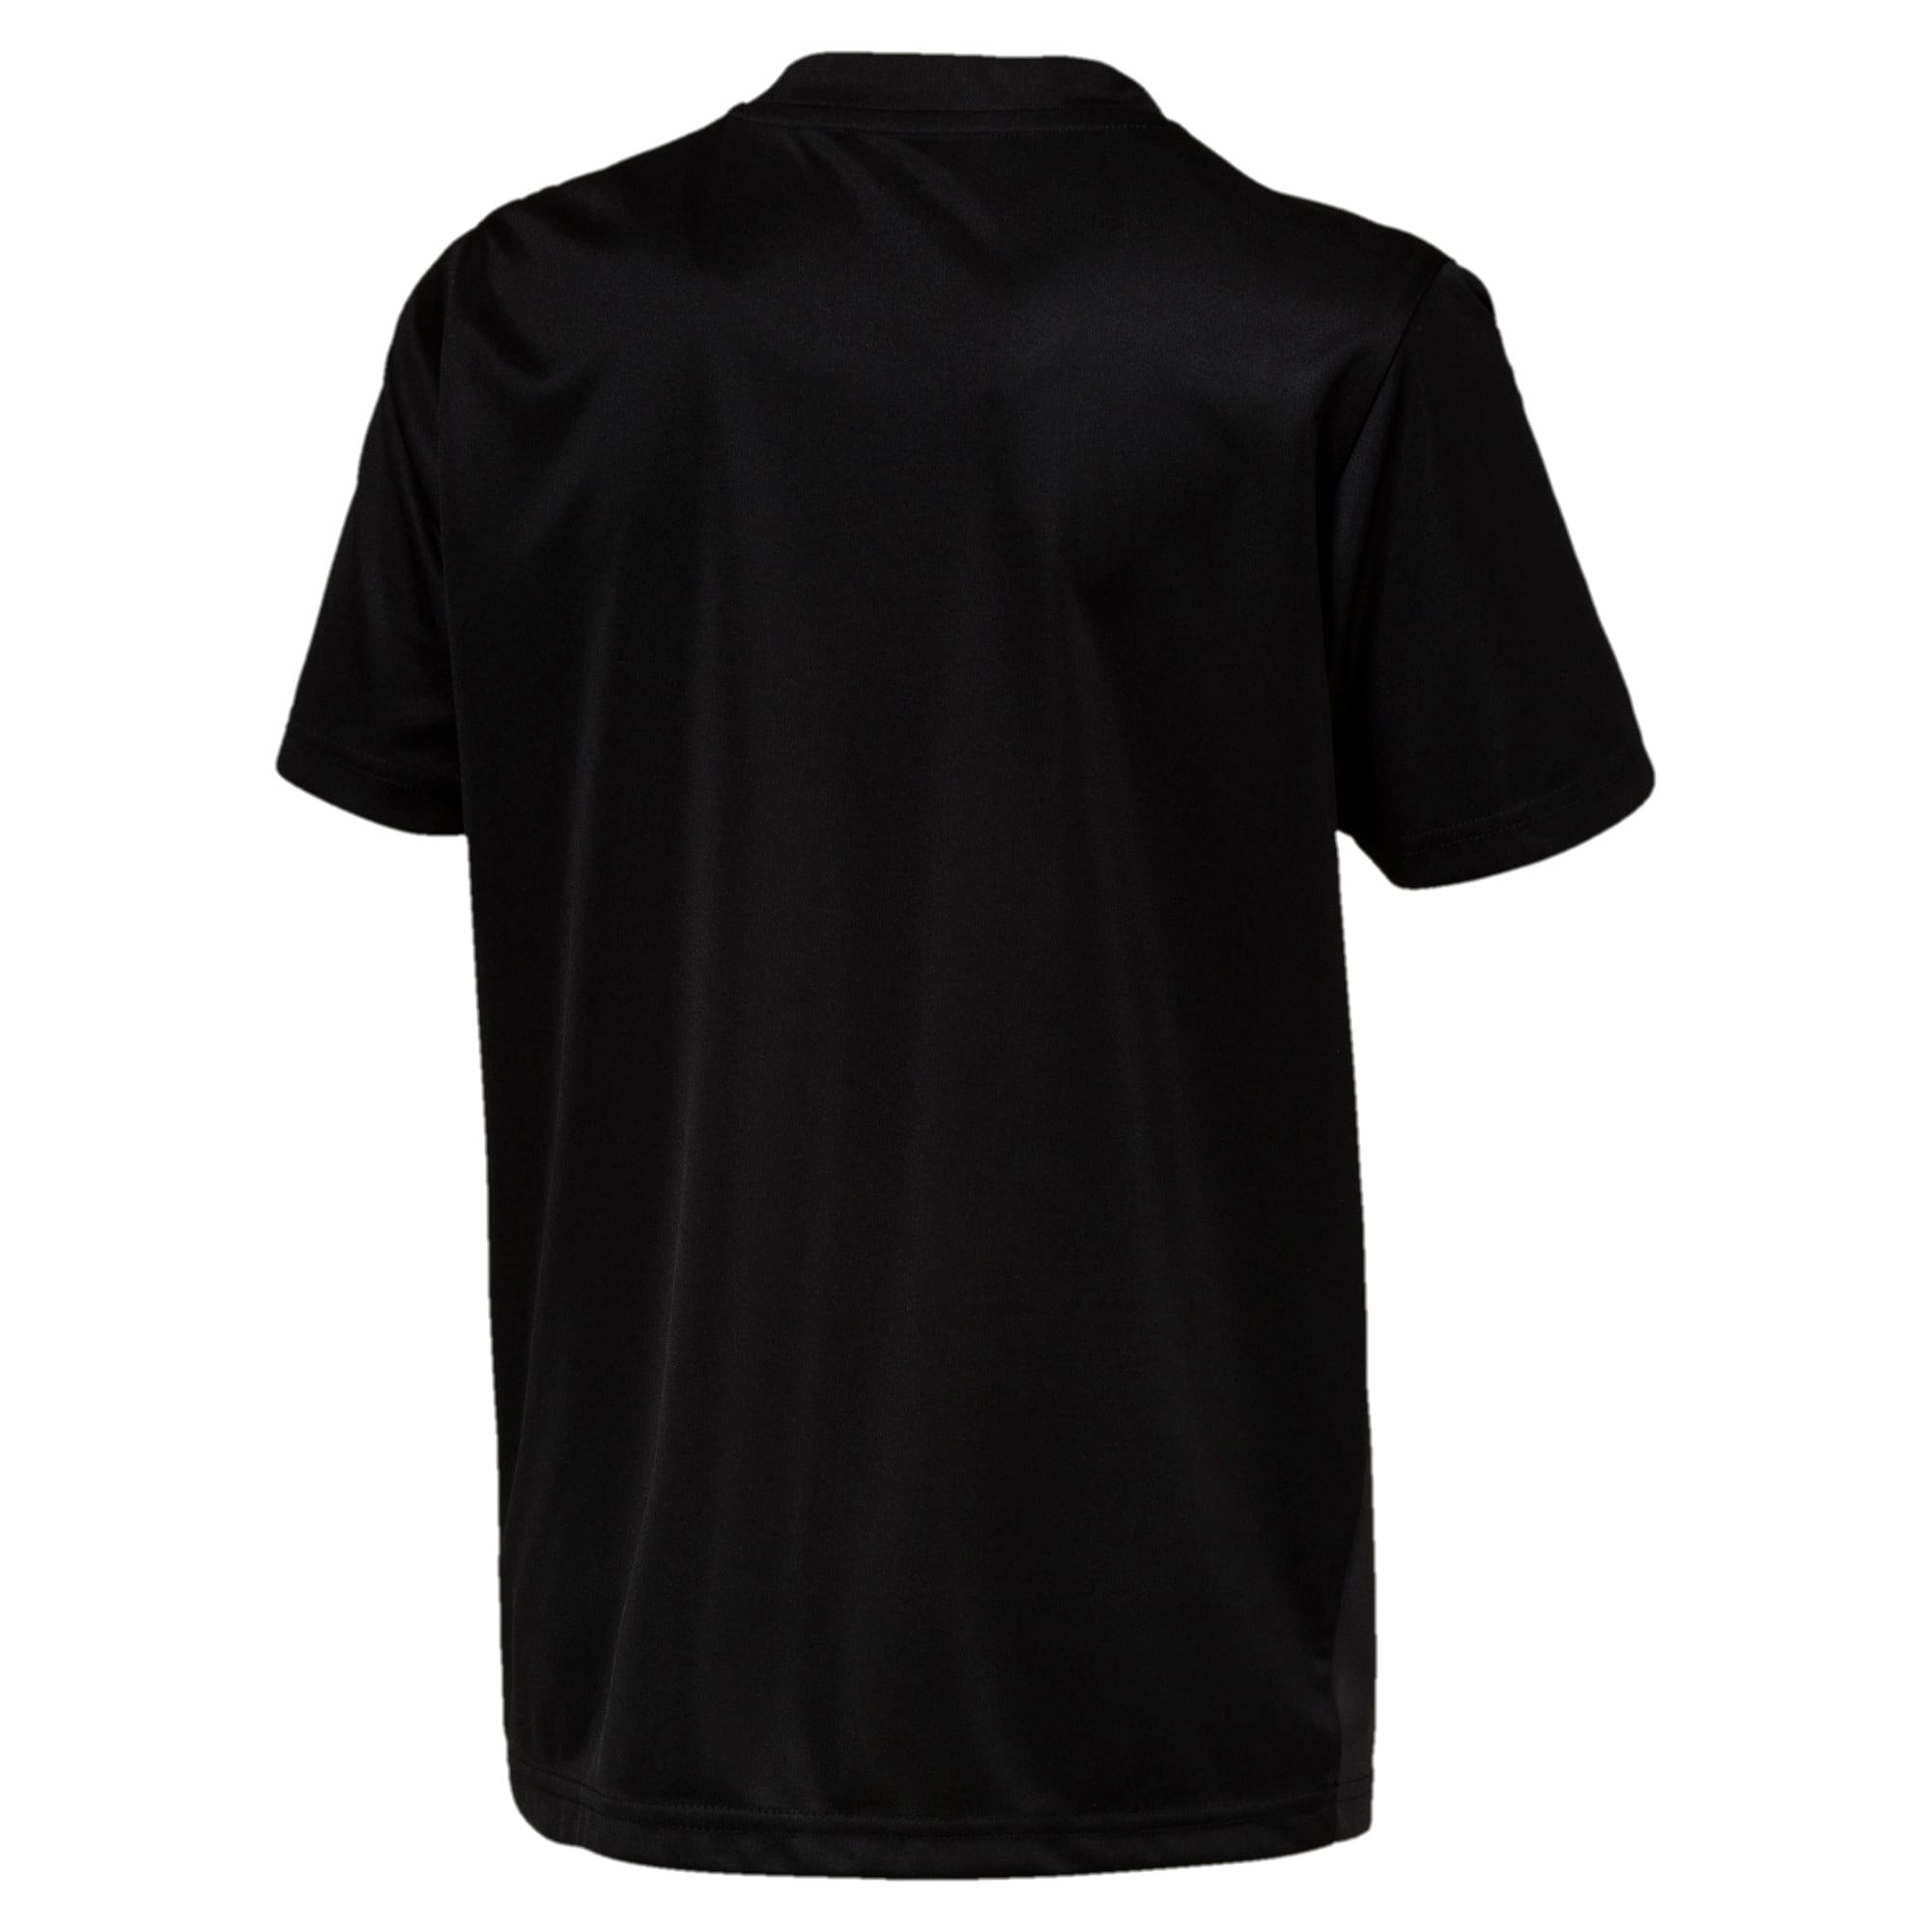 Thumbnail 2 of ftblPLAY Graphic Boys' Shirt, Asphalt-Puma Black, medium-IND